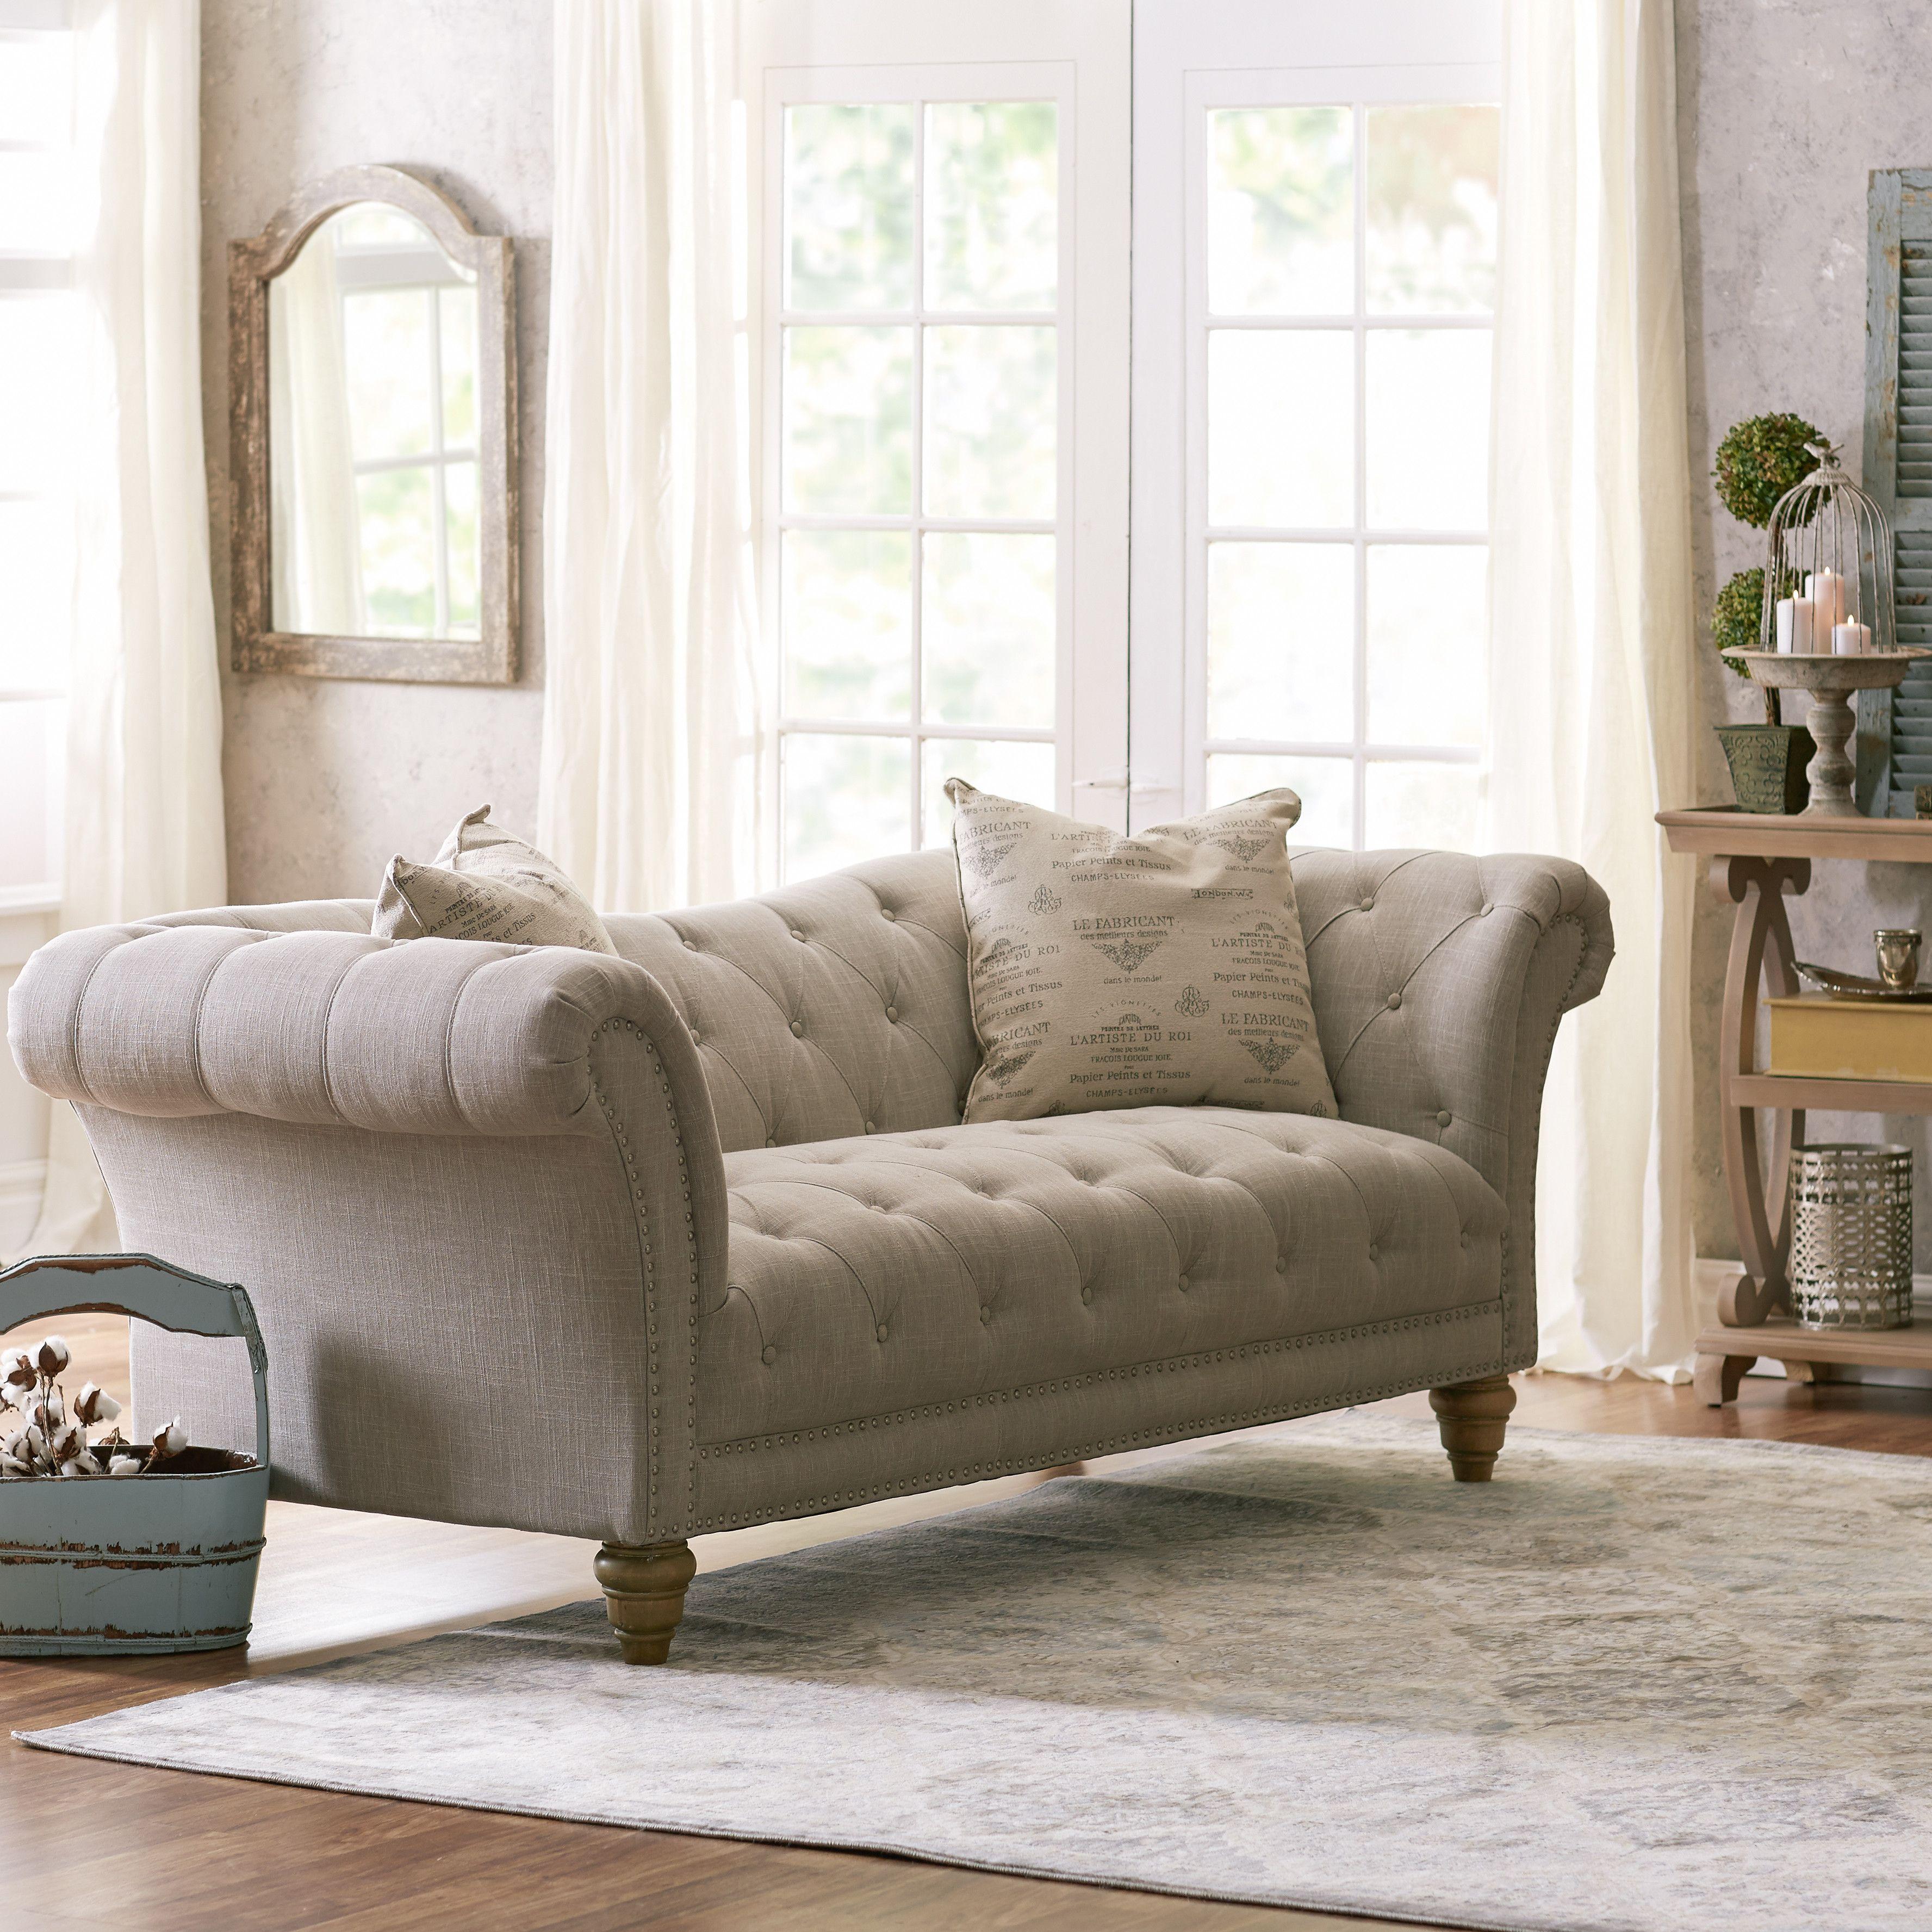 "Lark Manor Kiana 90"" Tufted Sofa Home Sweet Home"